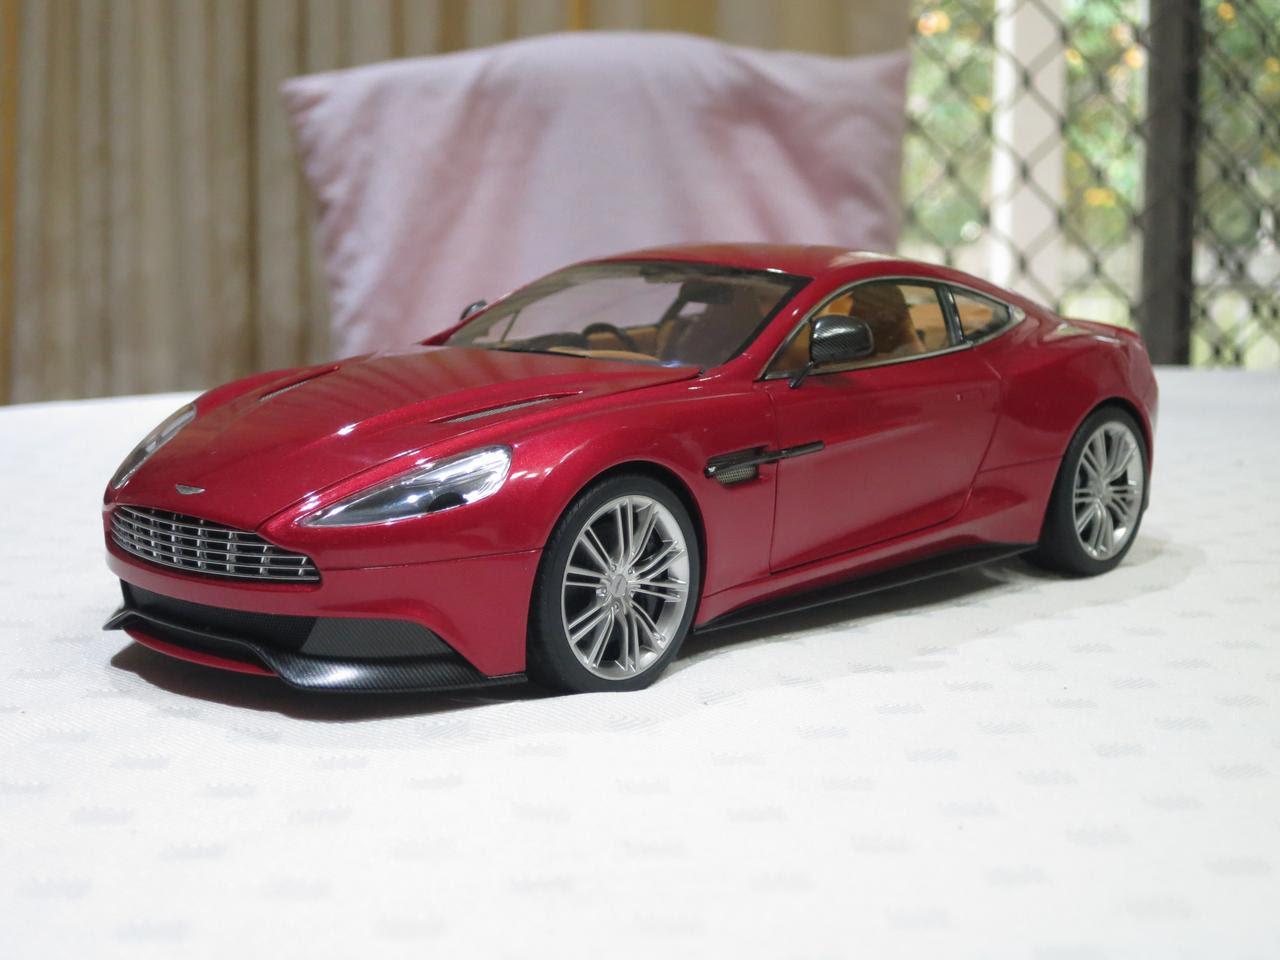 Aston Martin Vanquish 1 18 Volcano Red Autoart Diecastxchange Com Diecast Cars Forums